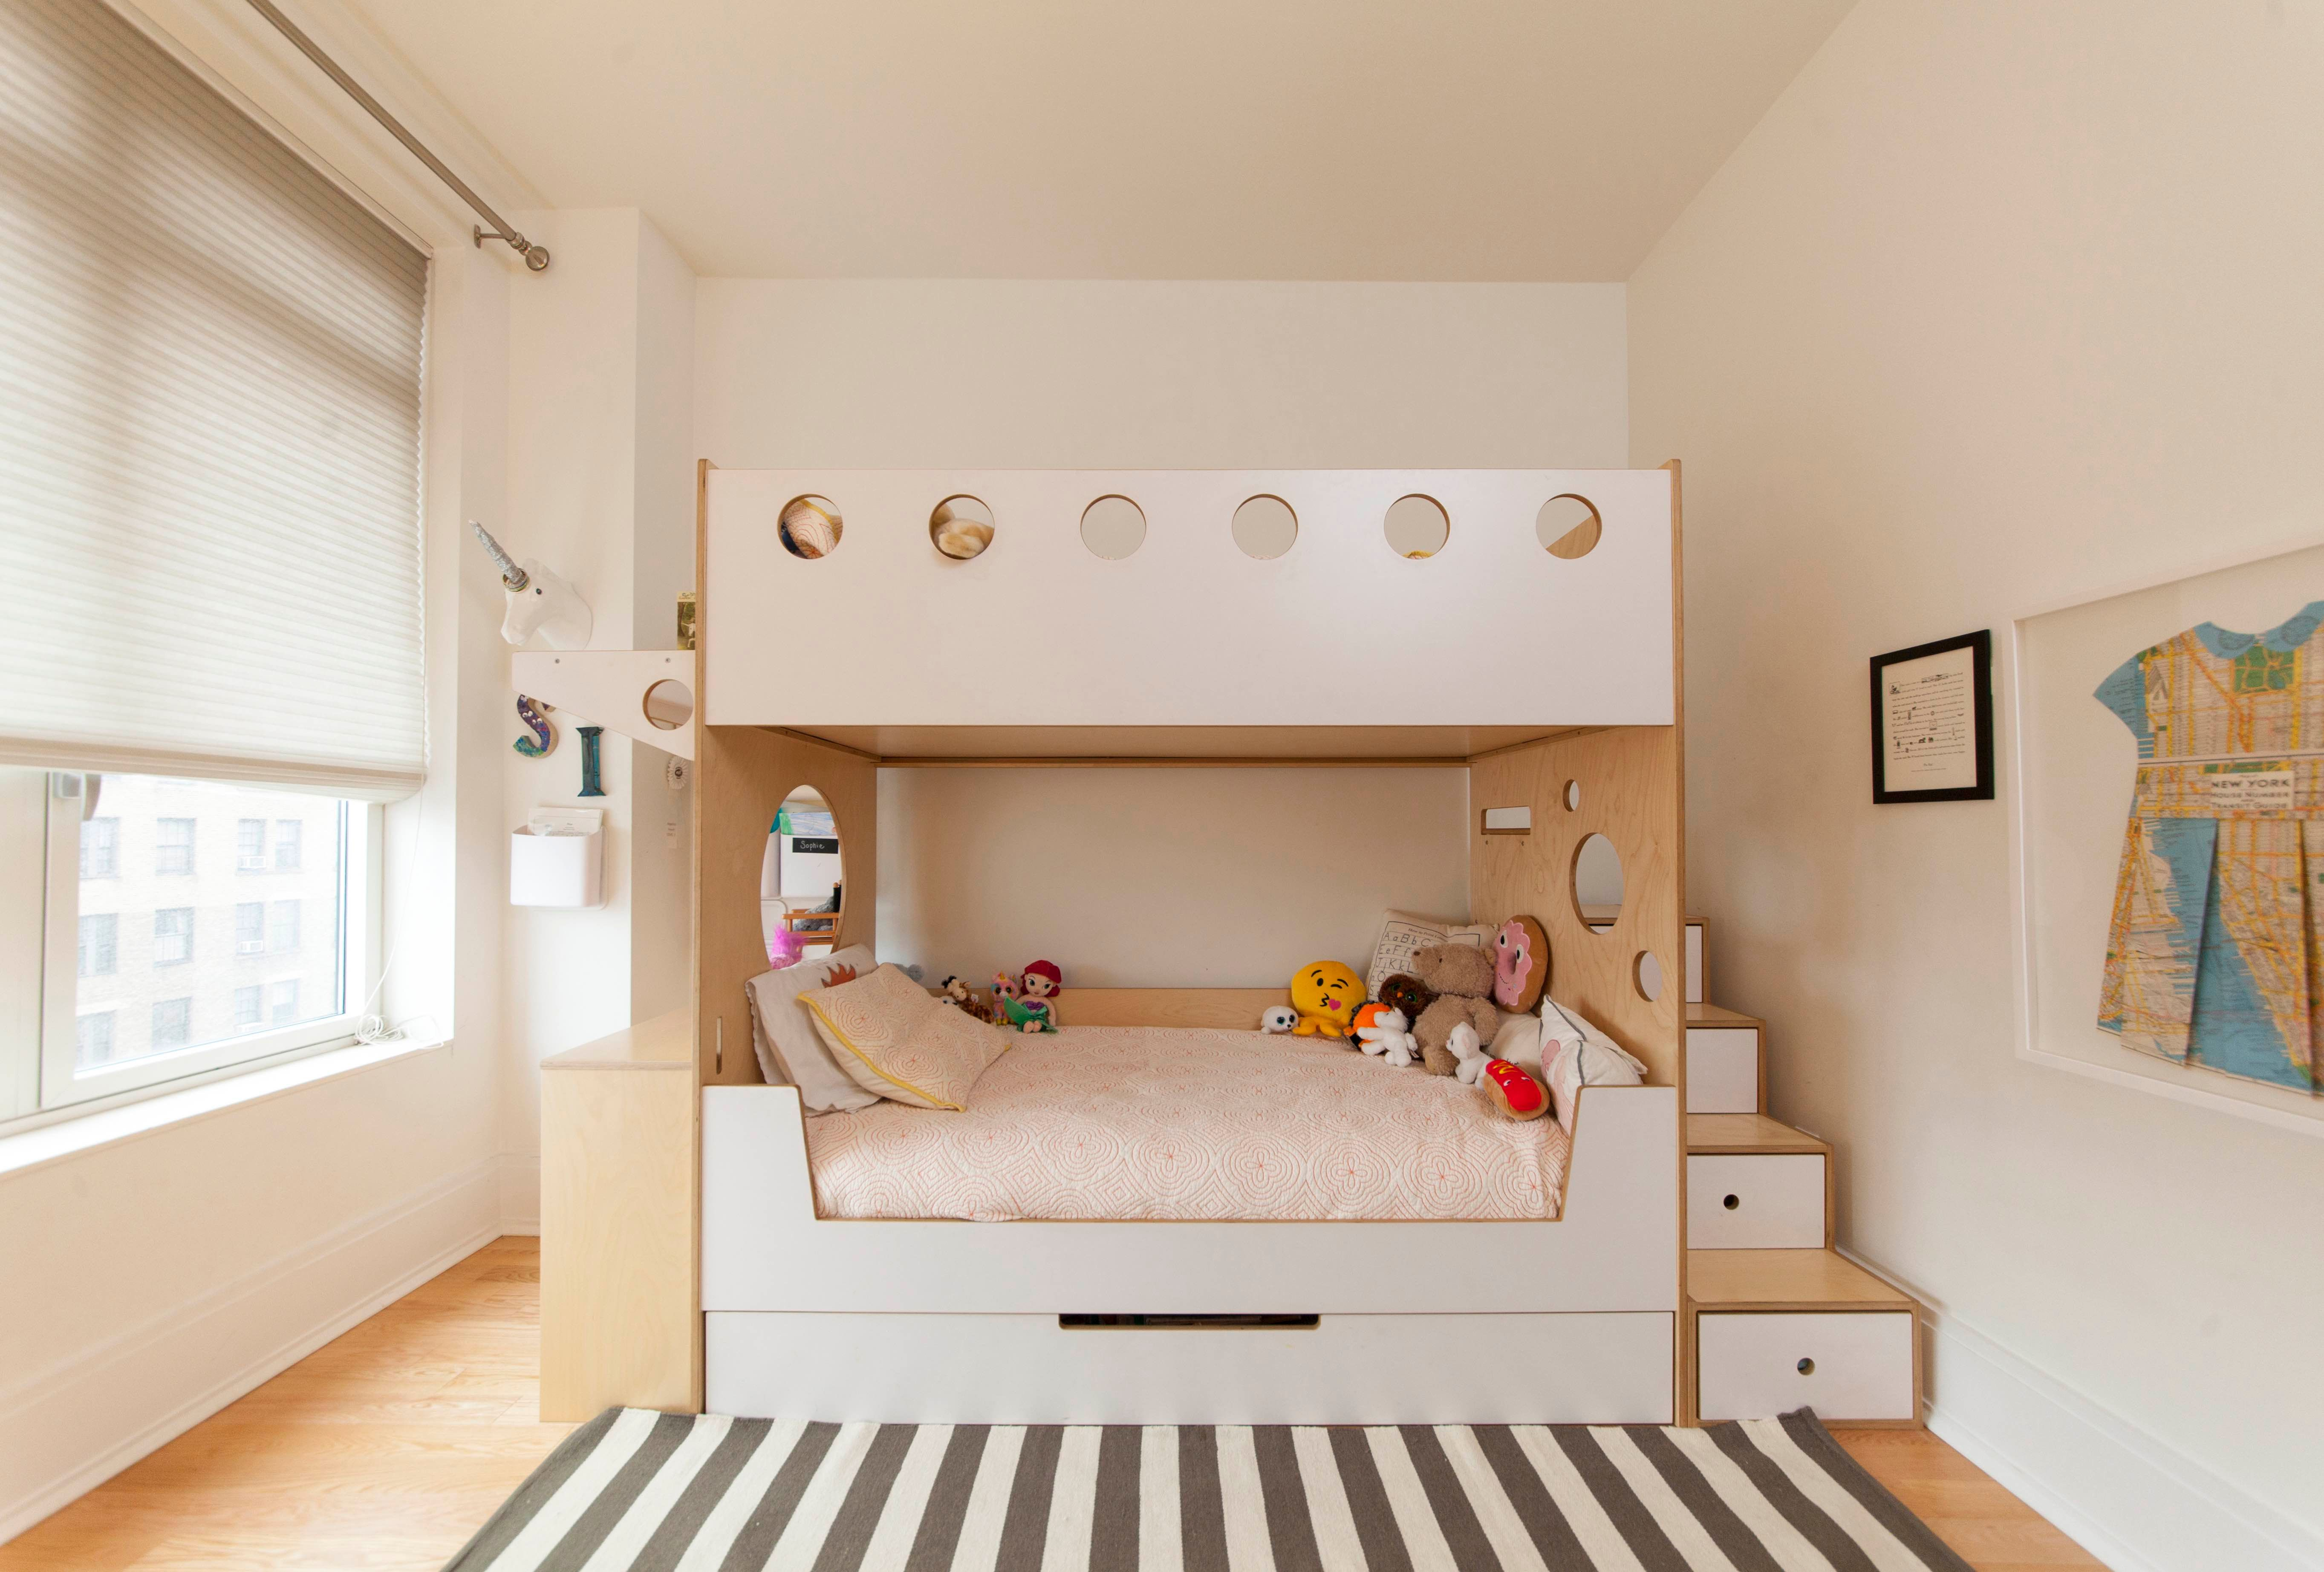 Sophie Metz Design Bunk Bed Designs Kids Room Design Home